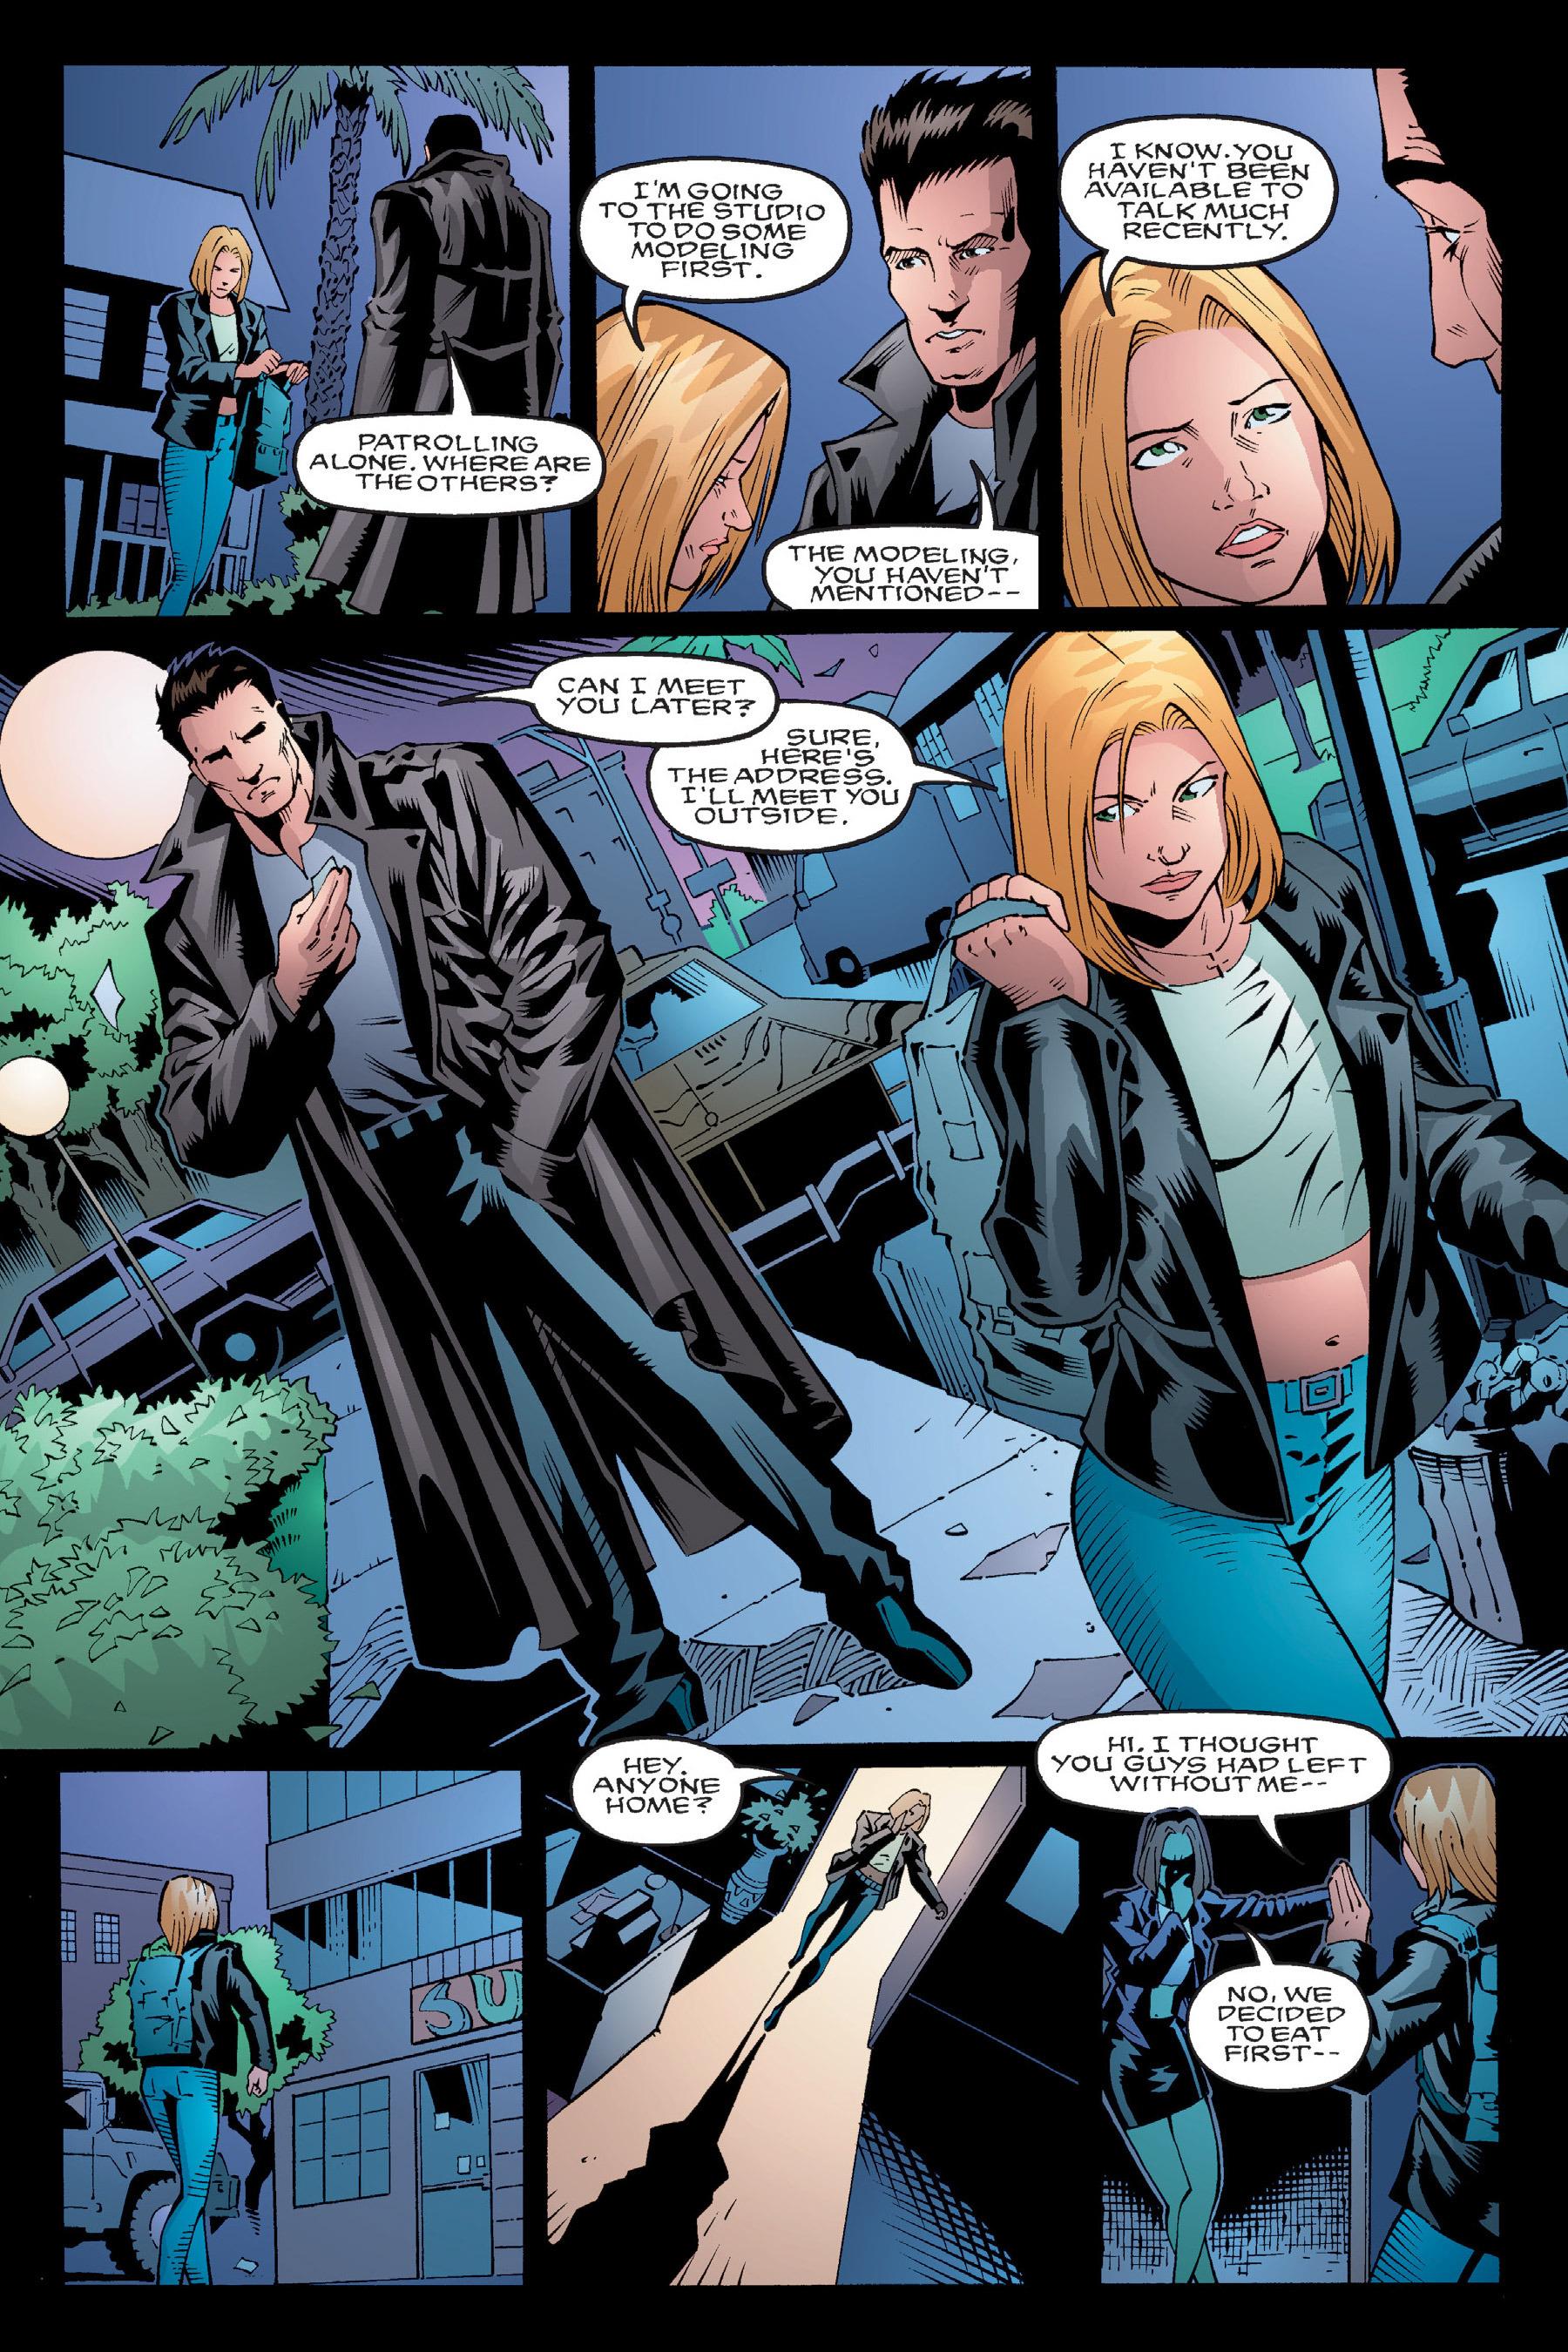 Read online Buffy the Vampire Slayer: Omnibus comic -  Issue # TPB 4 - 47